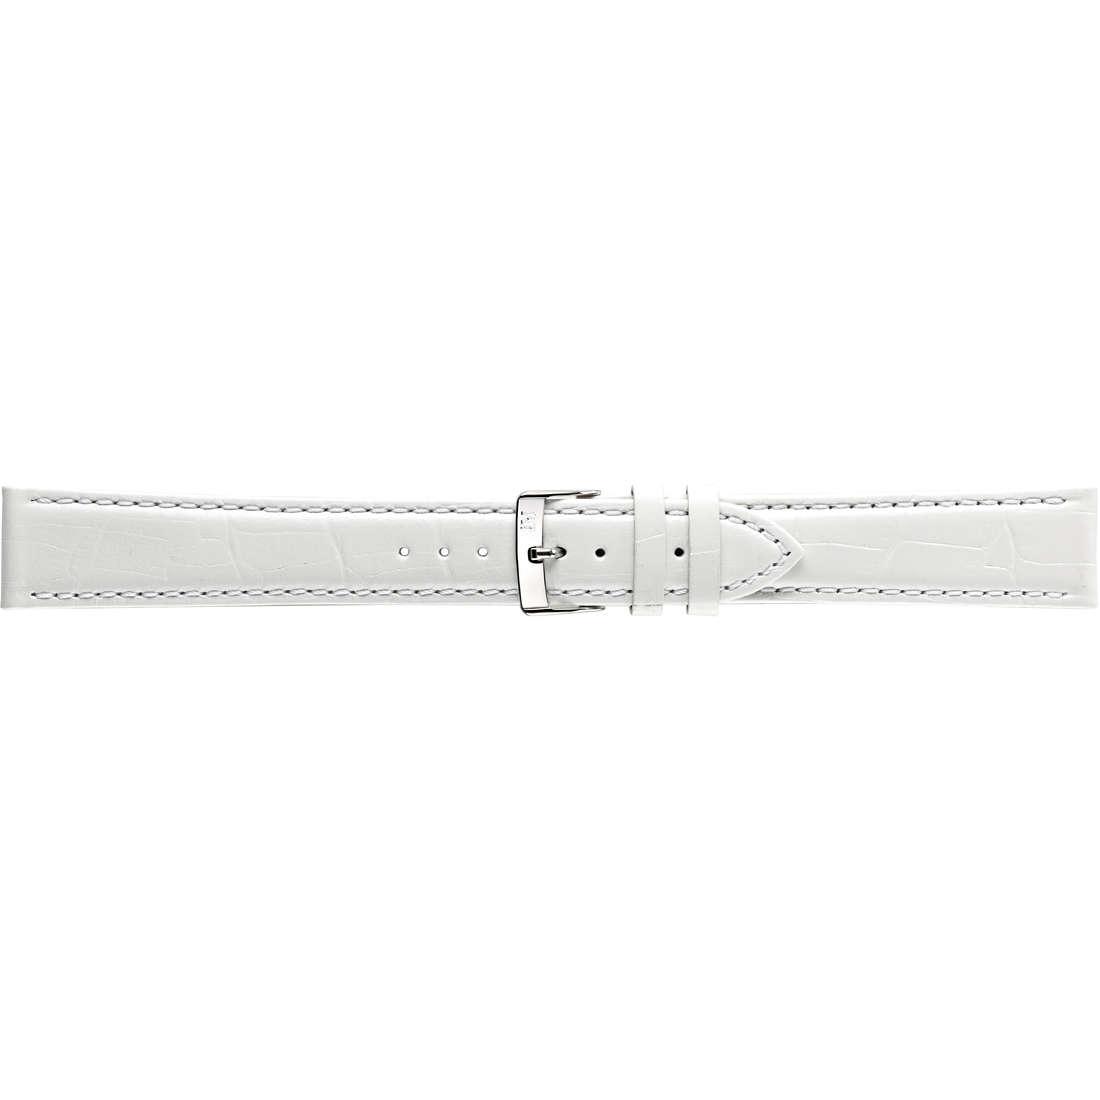 montre bande de montres unisex Morellato I Lunghi A01Y2269480017CR18